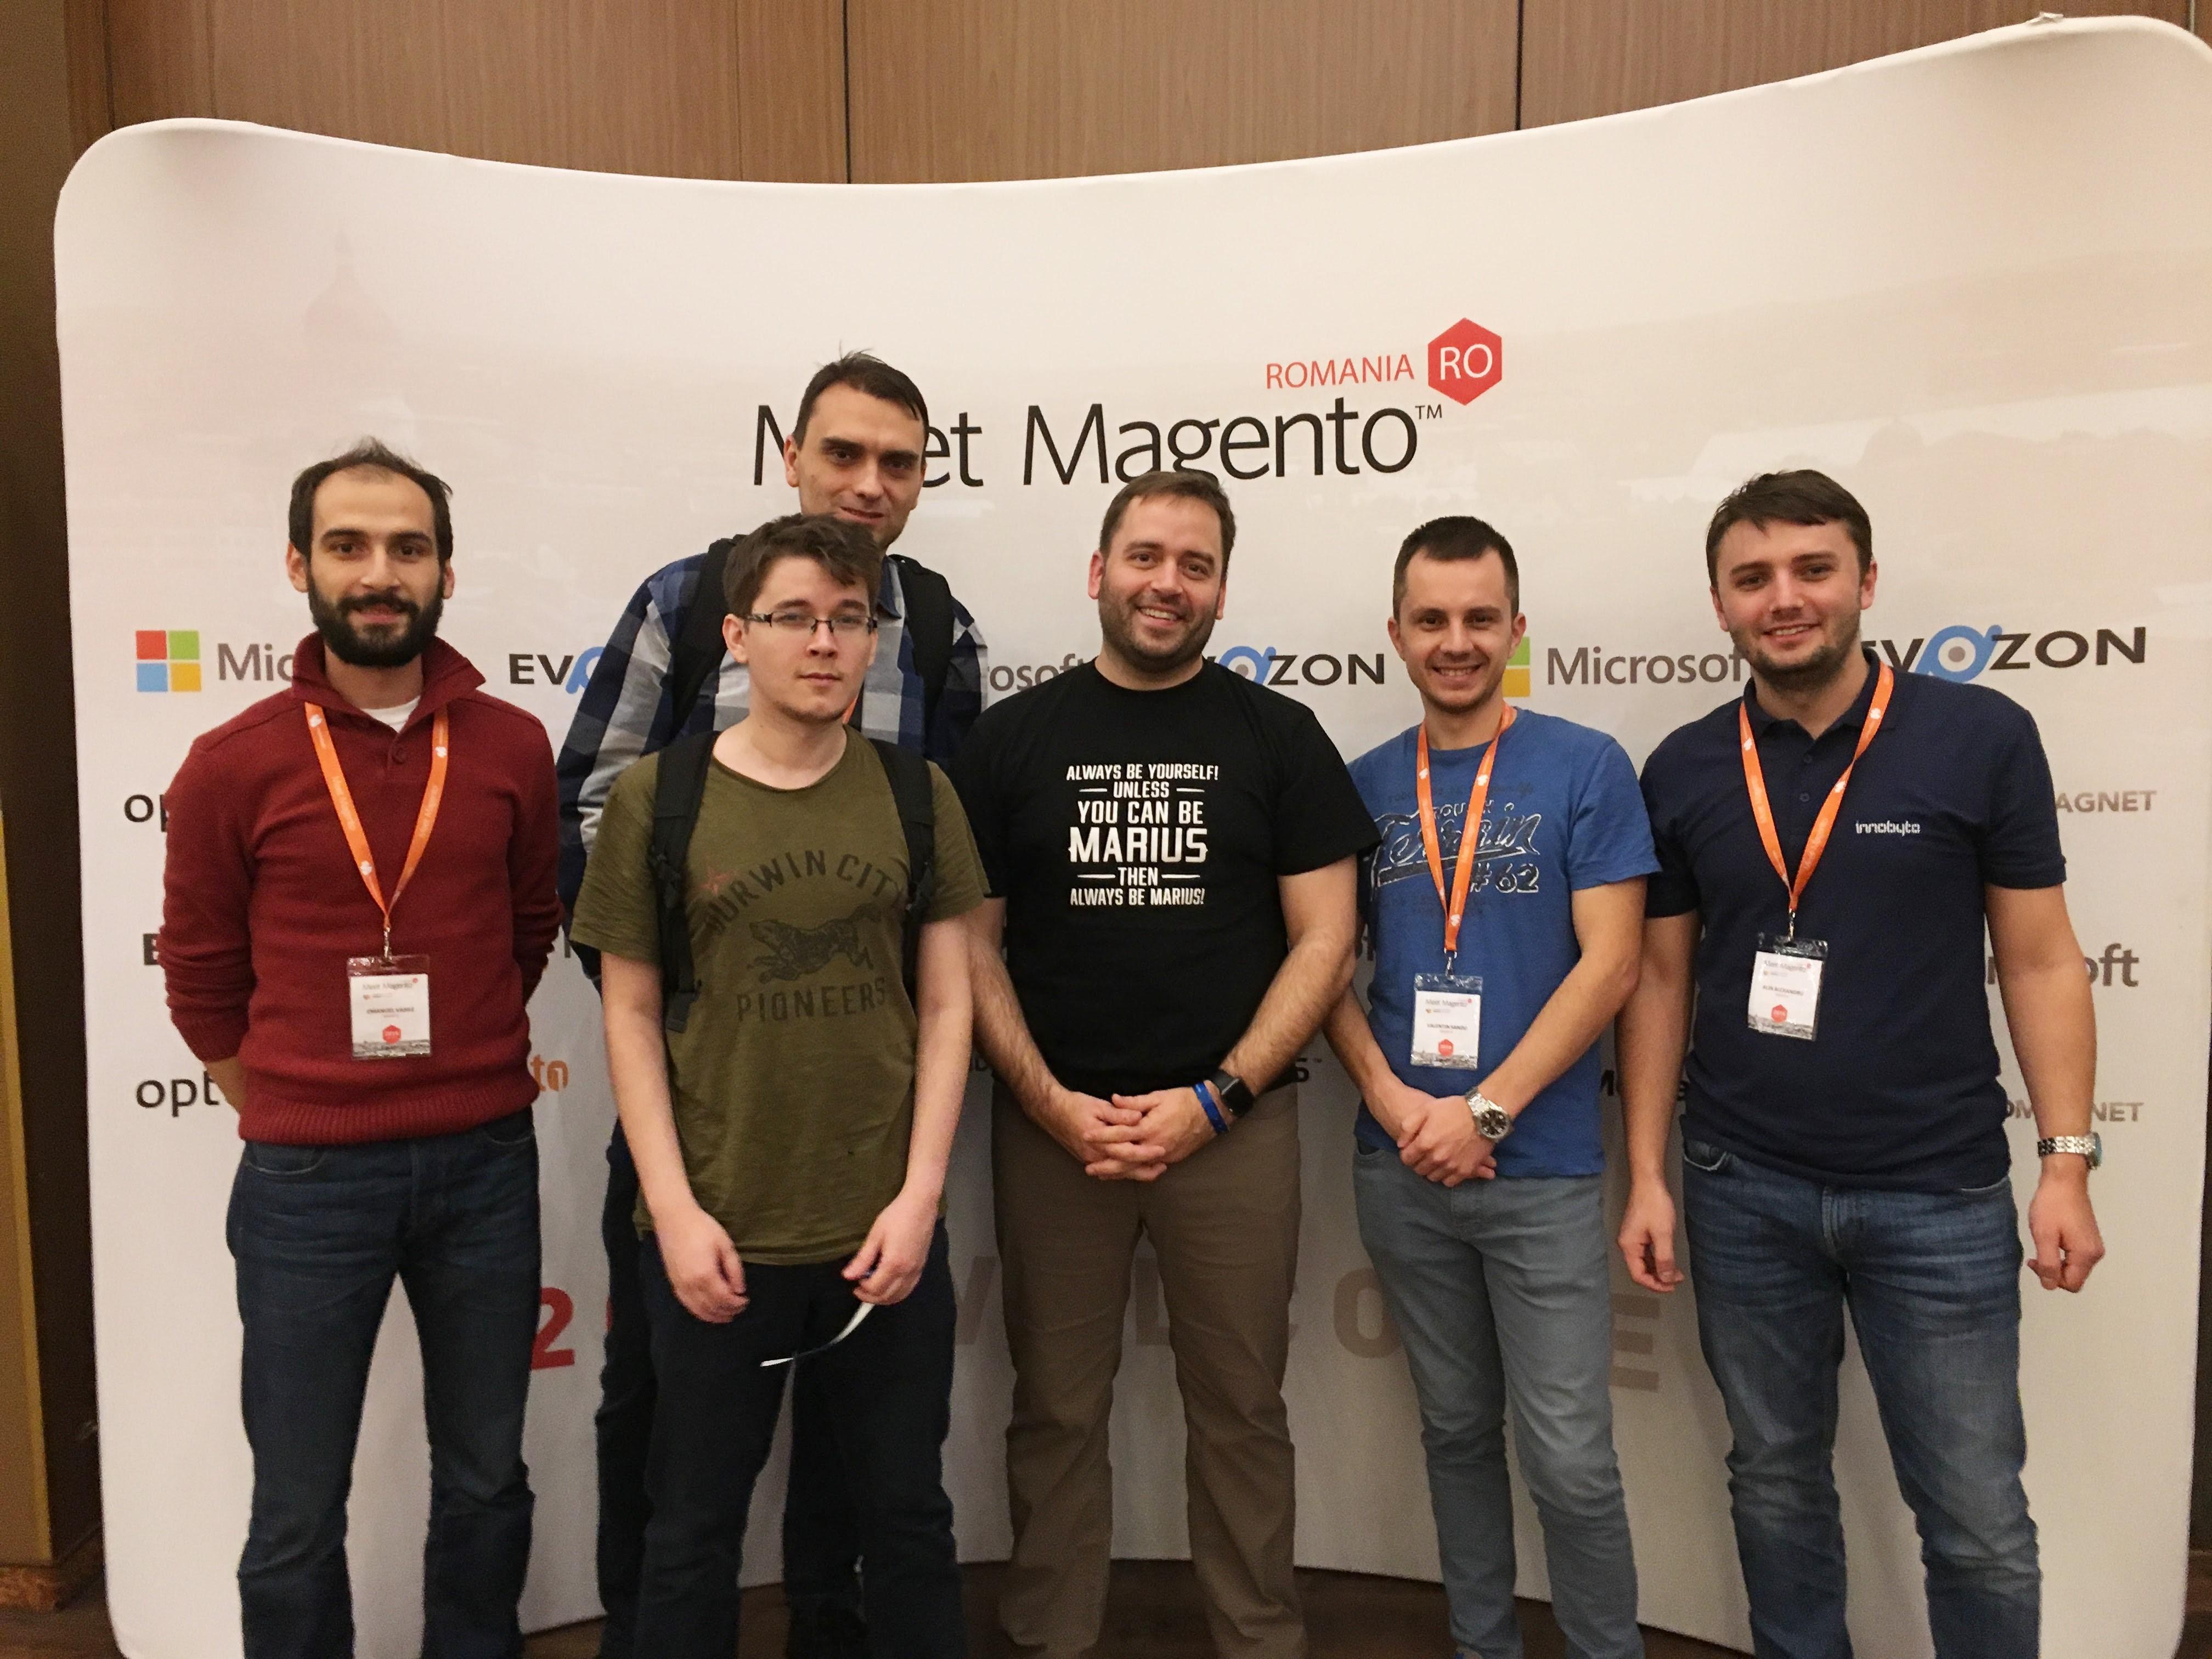 Innobyte was at Meet Magento Romania